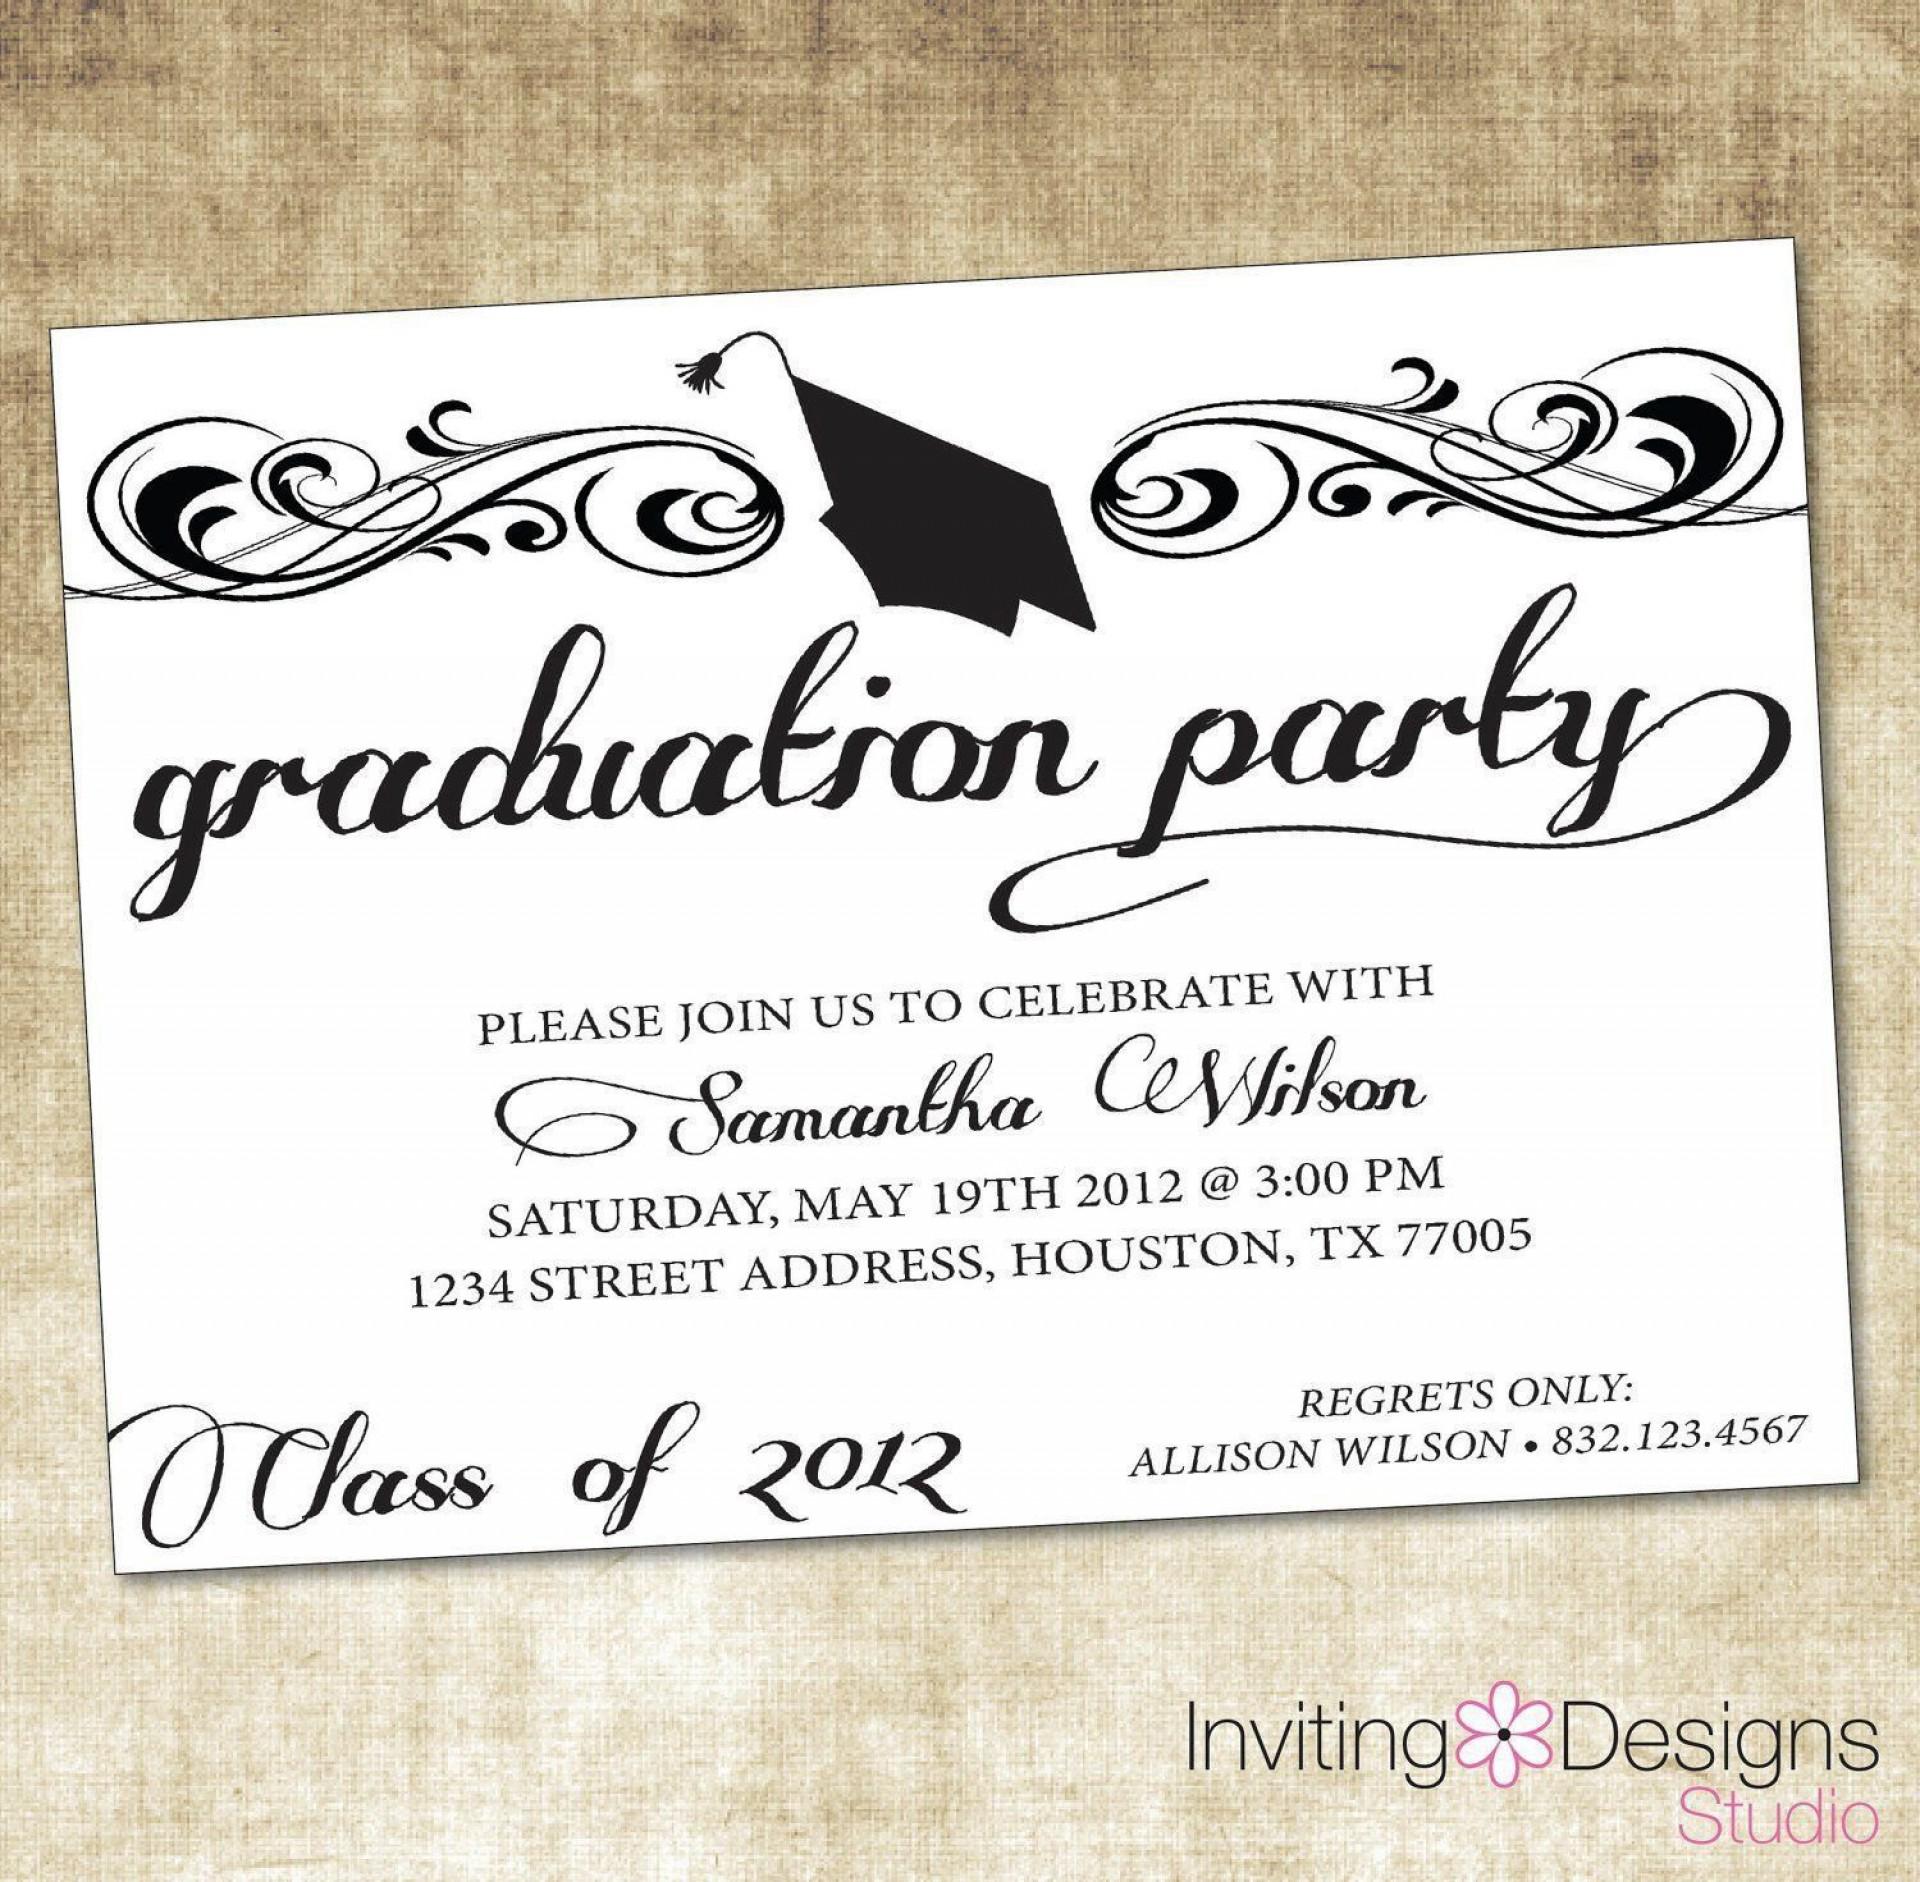 009 Breathtaking Microsoft Word Graduation Invitation Template Design  Party1920